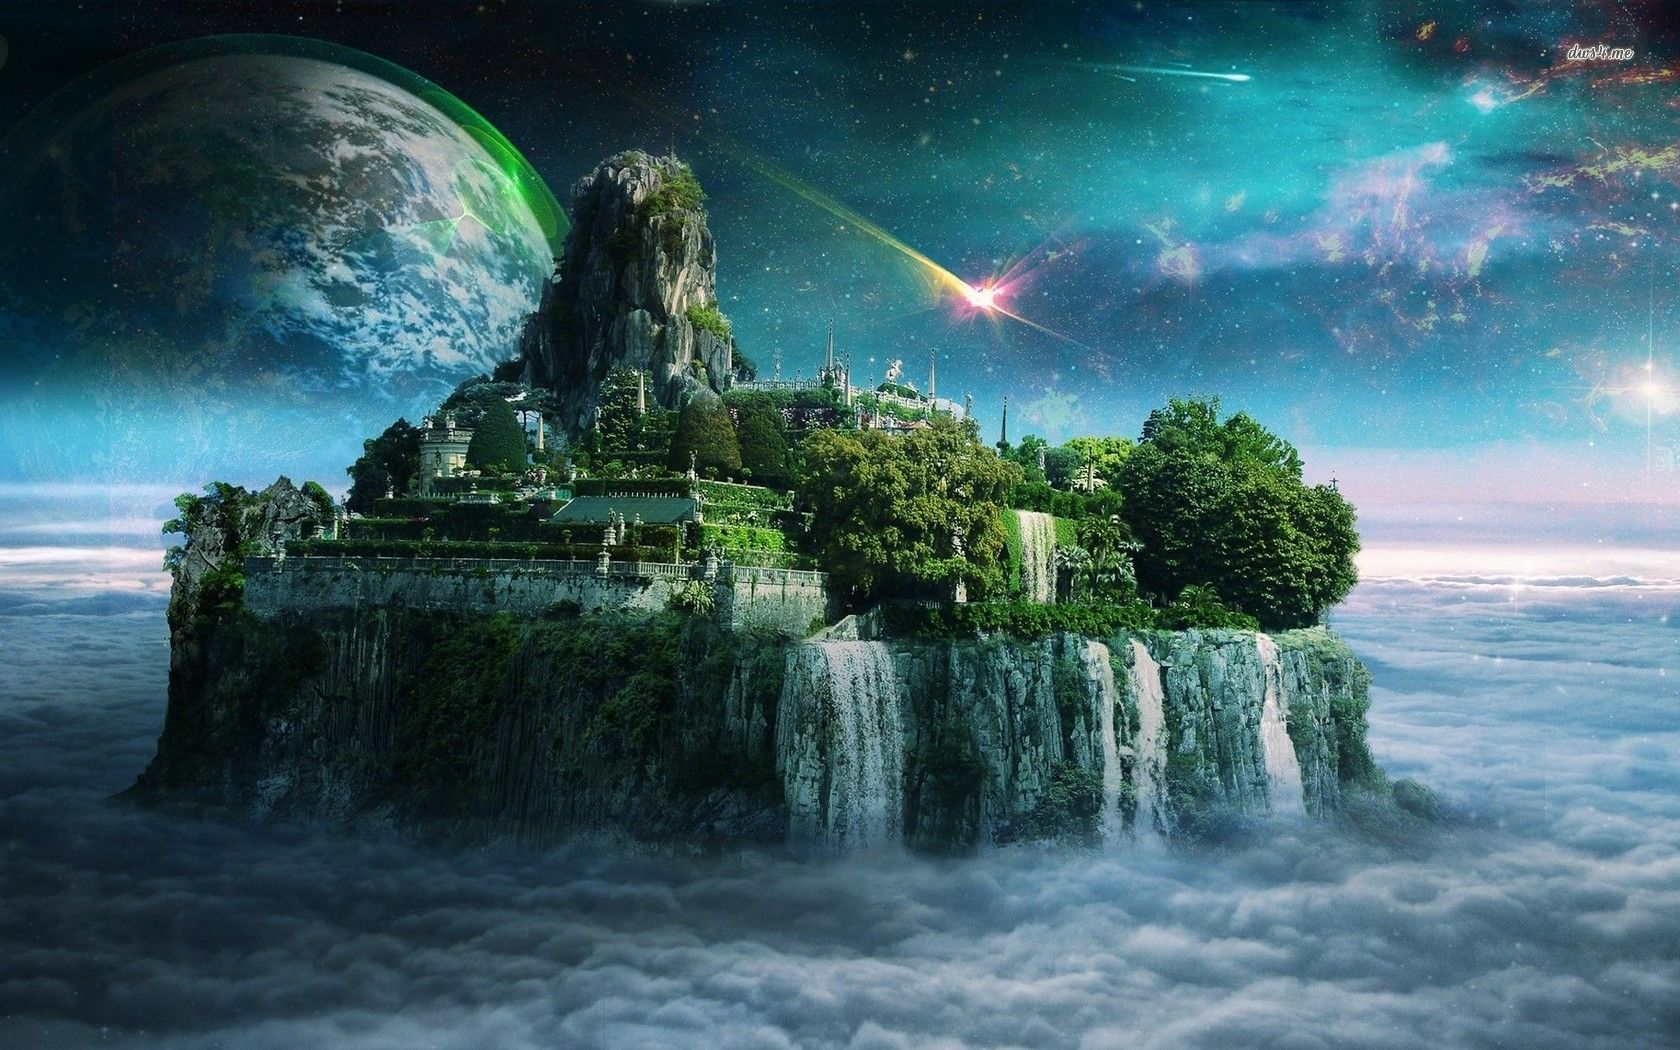 Kingdom On A Floating Island Hd Wallpaper Fantasy Landscape Fantasy Art Landscapes Island Art